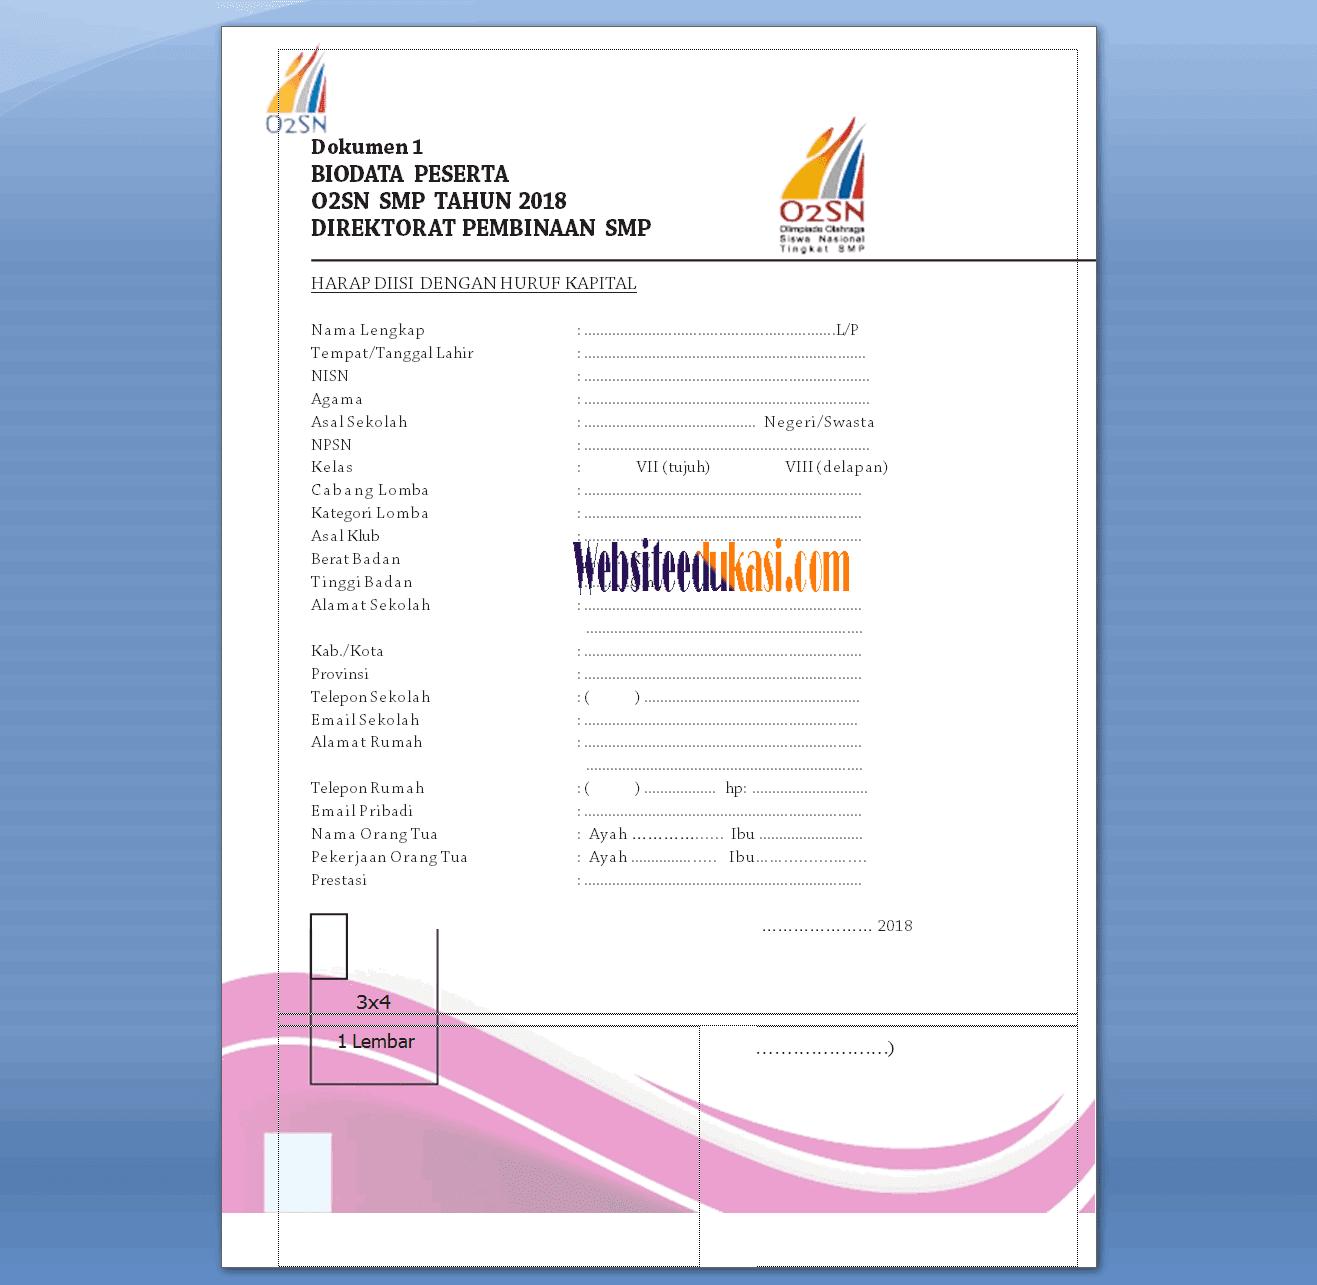 Biodata Peserta O2sn Terbaru 2018